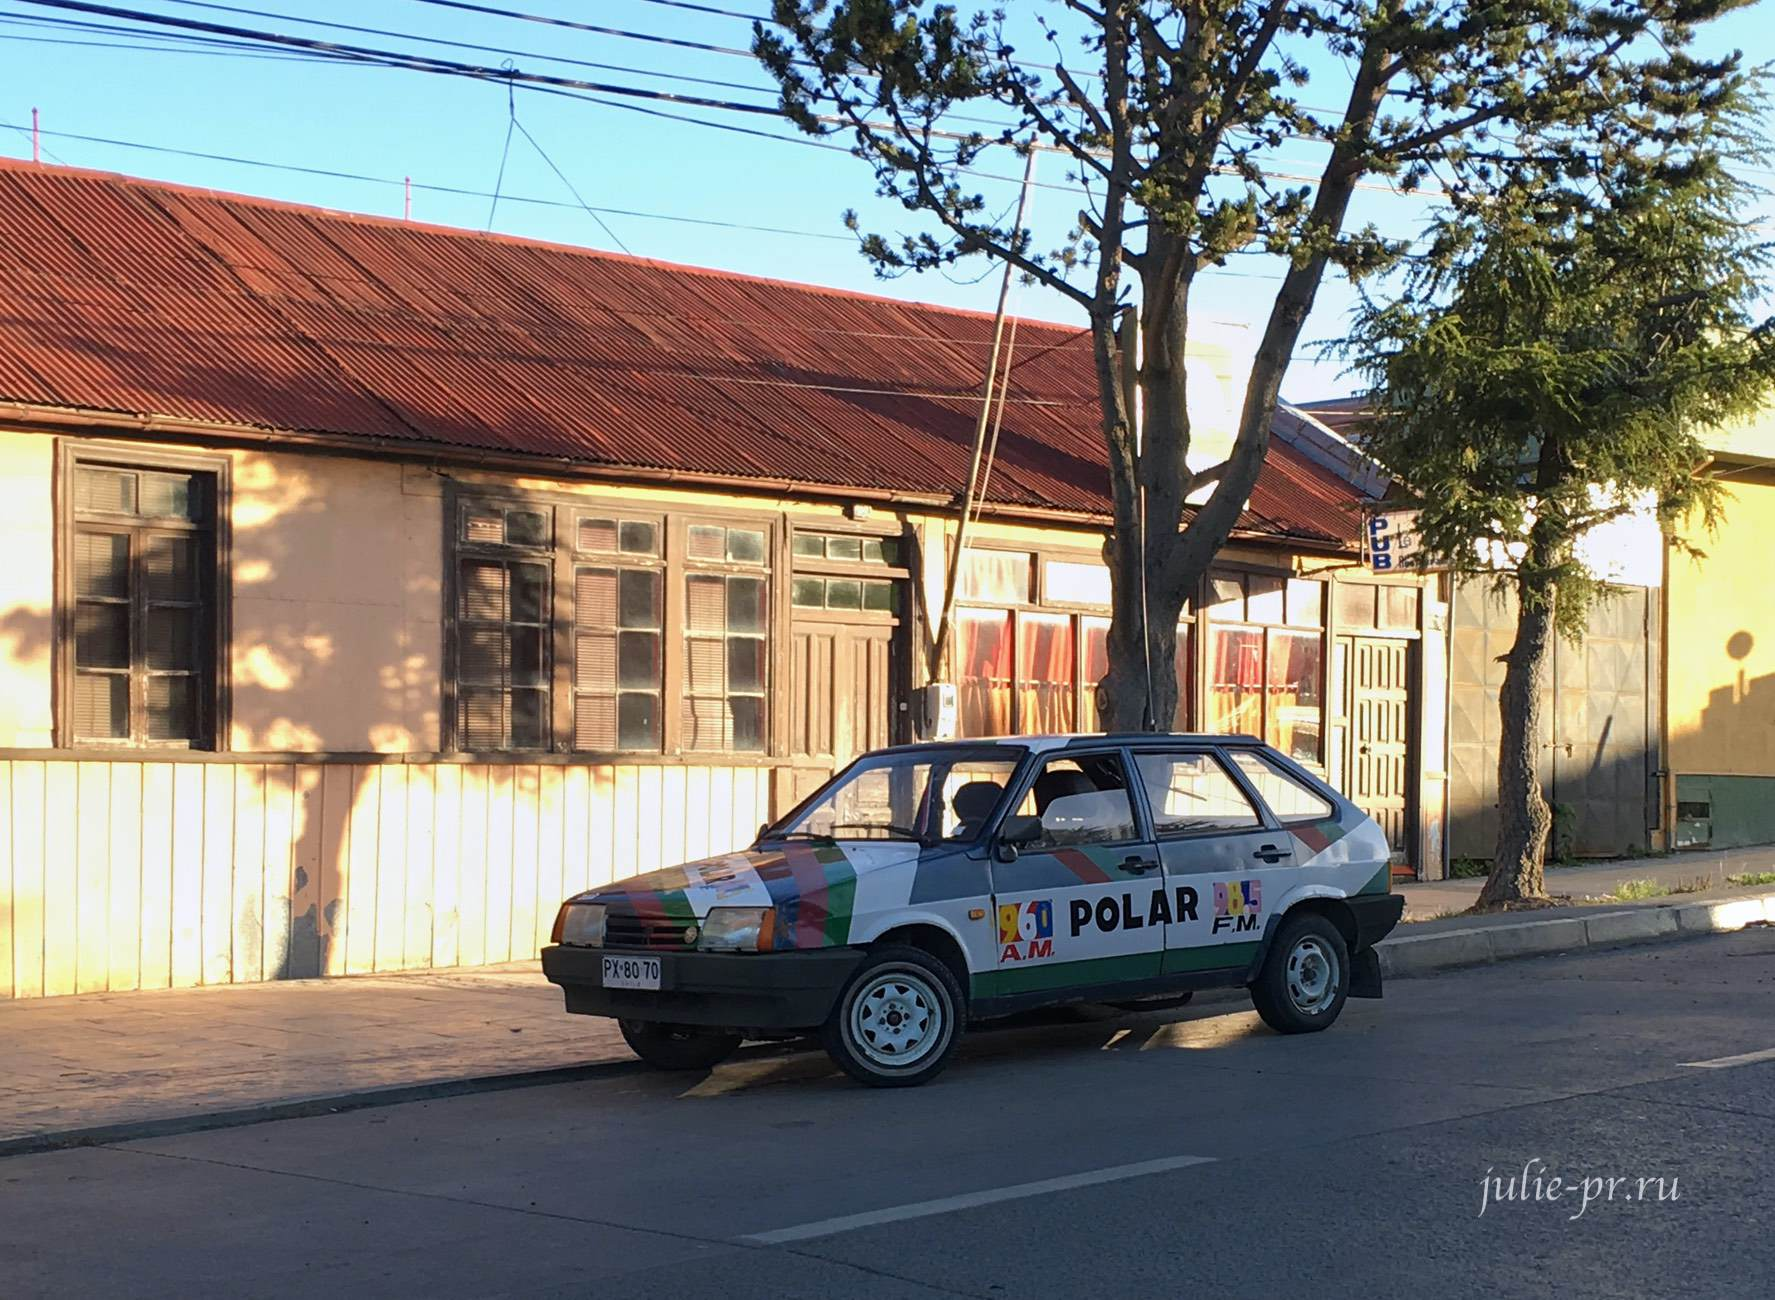 Чили, Патагония, Пуэрто-Наталес, Автомобиль Лада